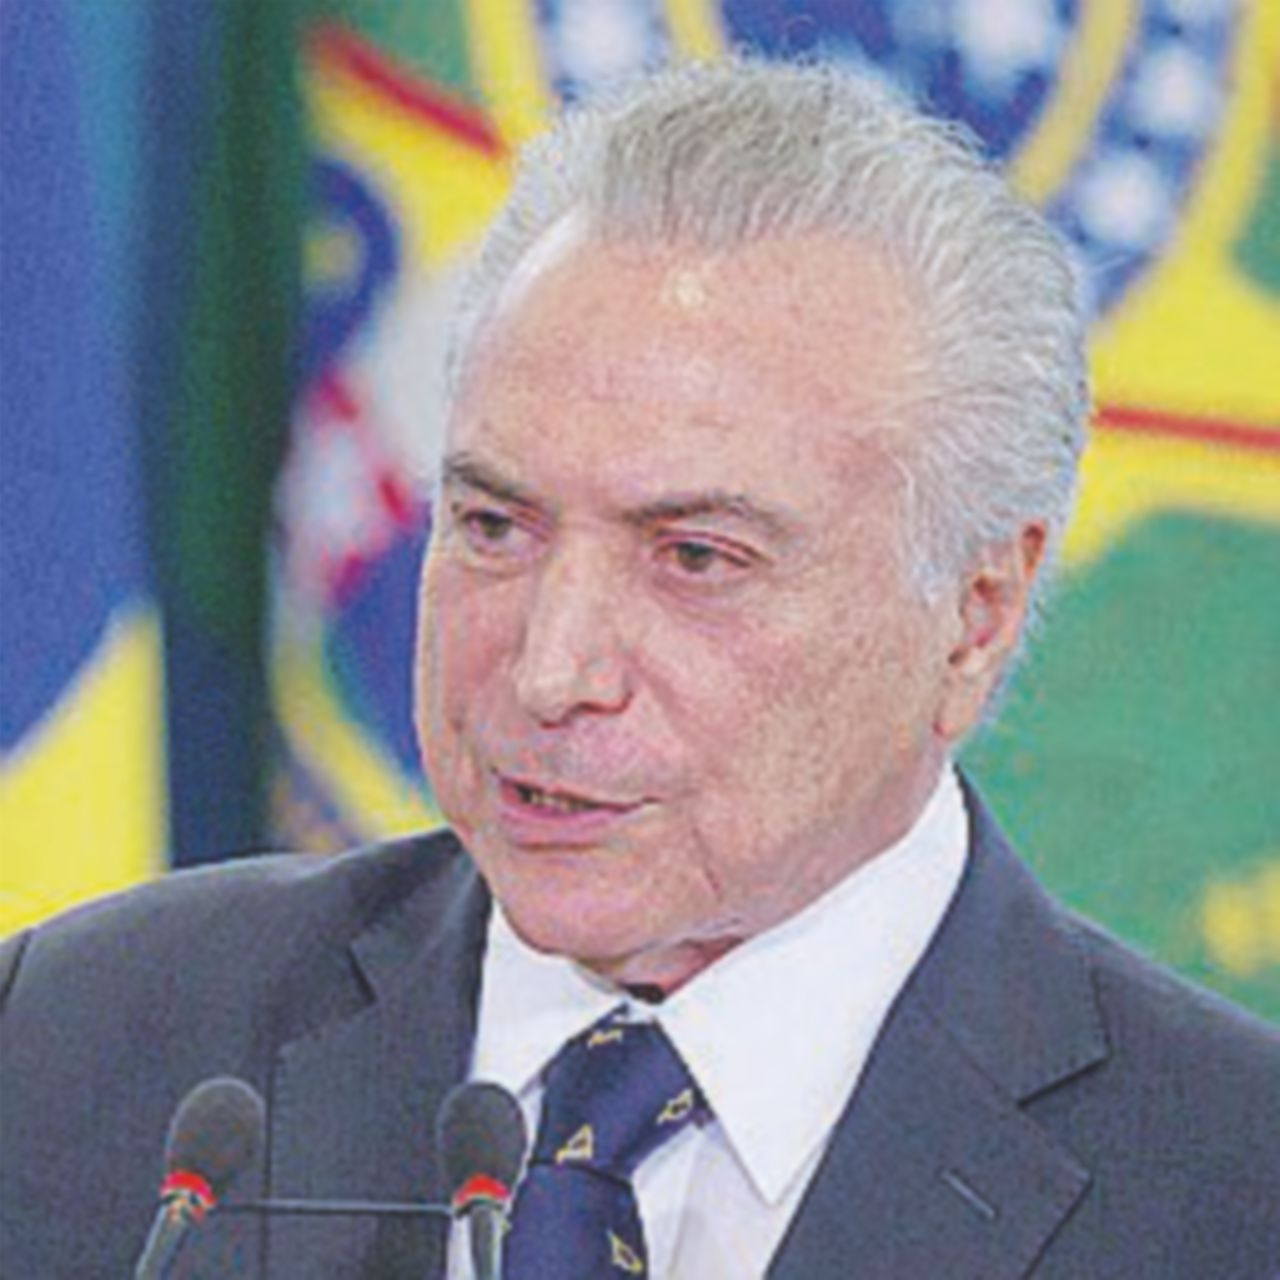 Temer cacciato dai fantasmi e Dilma rispolvera Lula